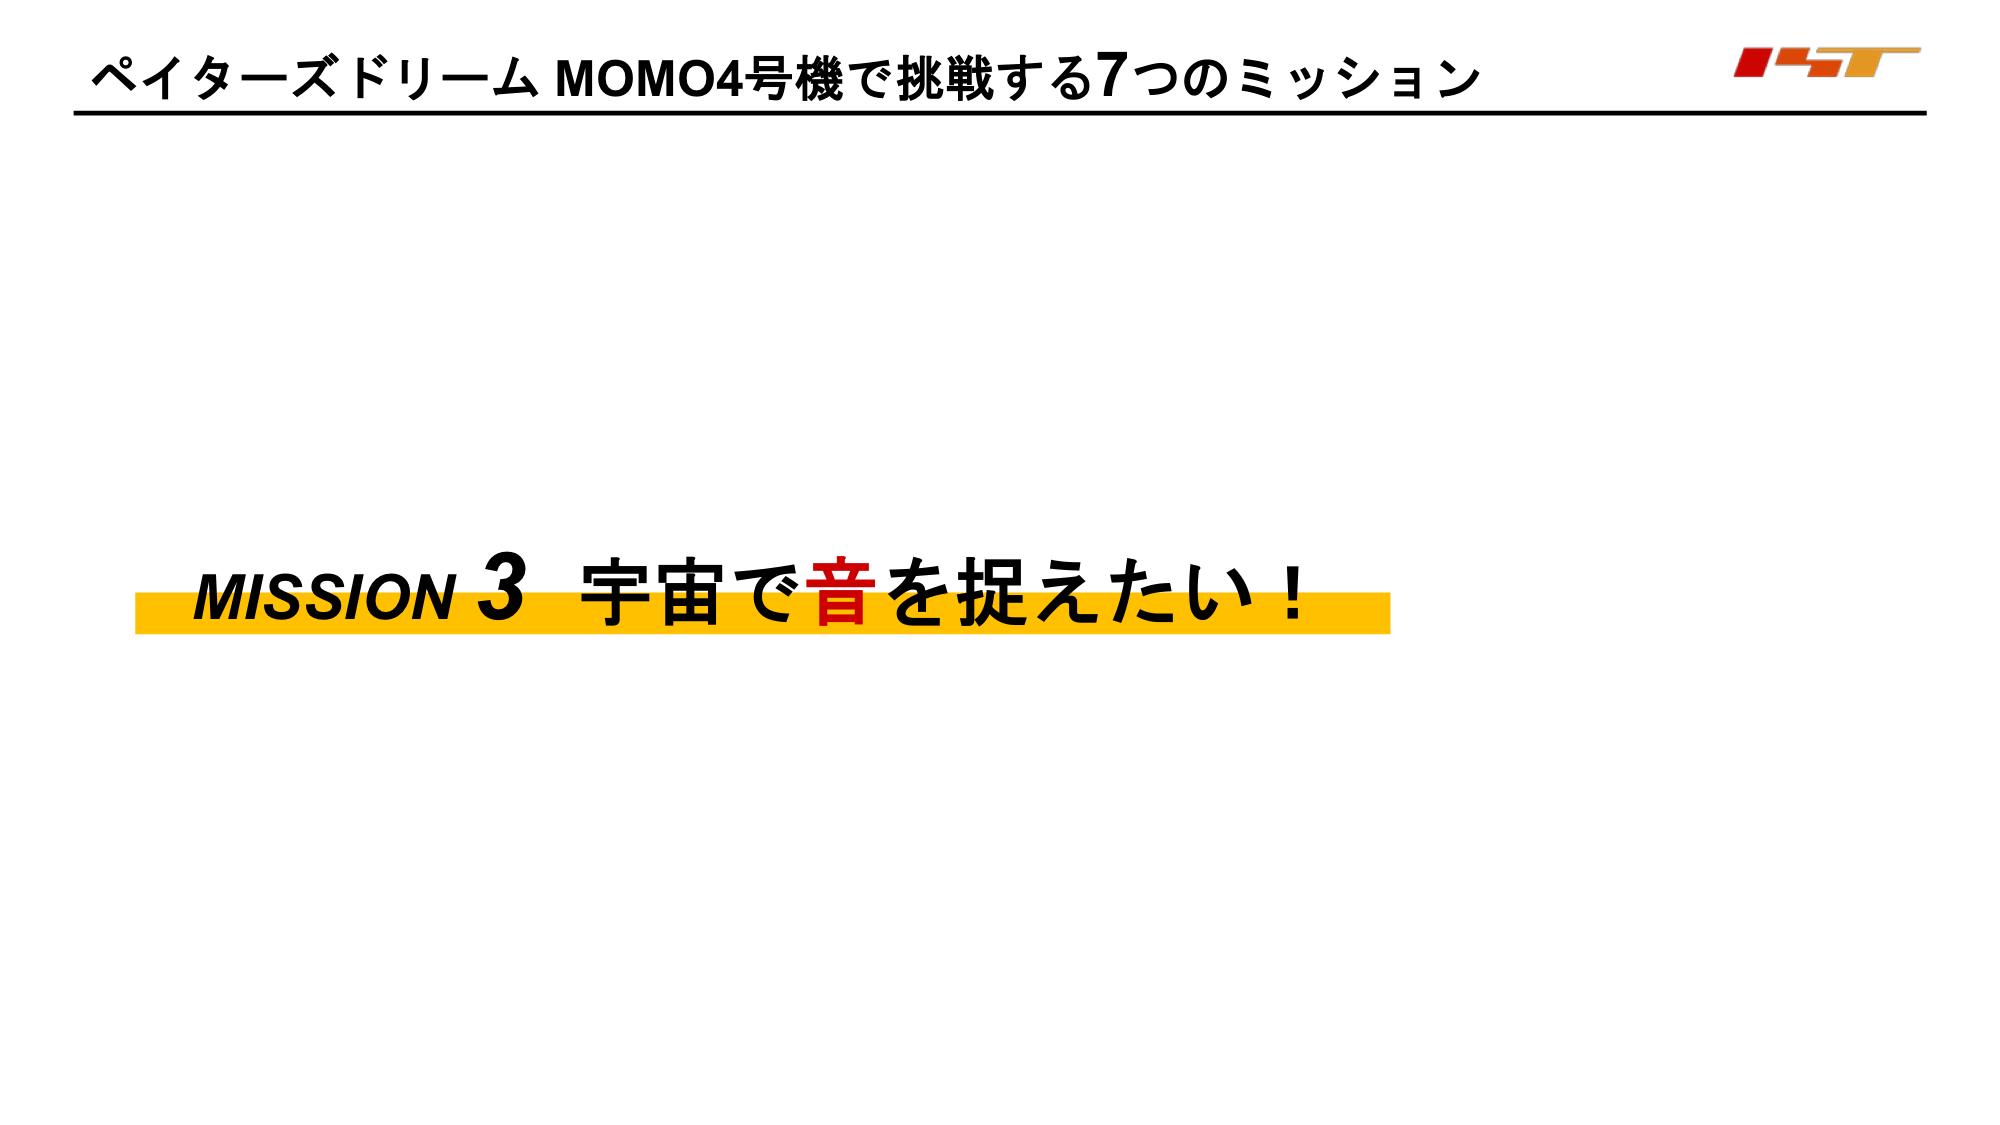 f:id:Imamura:20190628161251p:plain